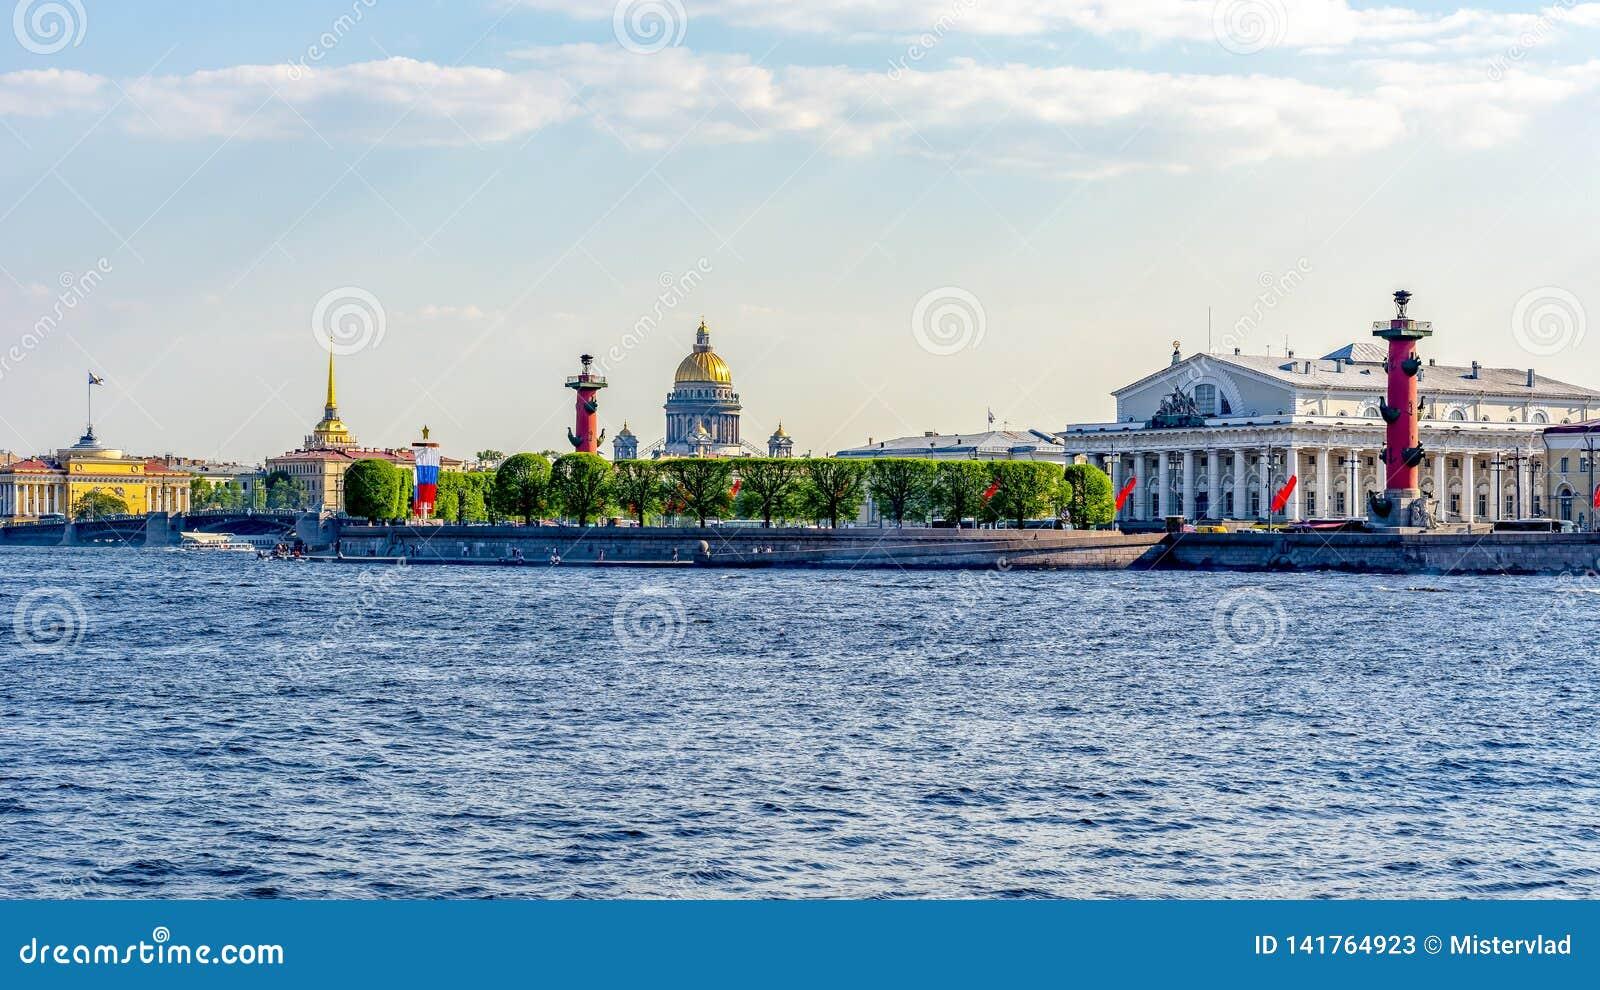 St. Petersburg cityscape, Russia